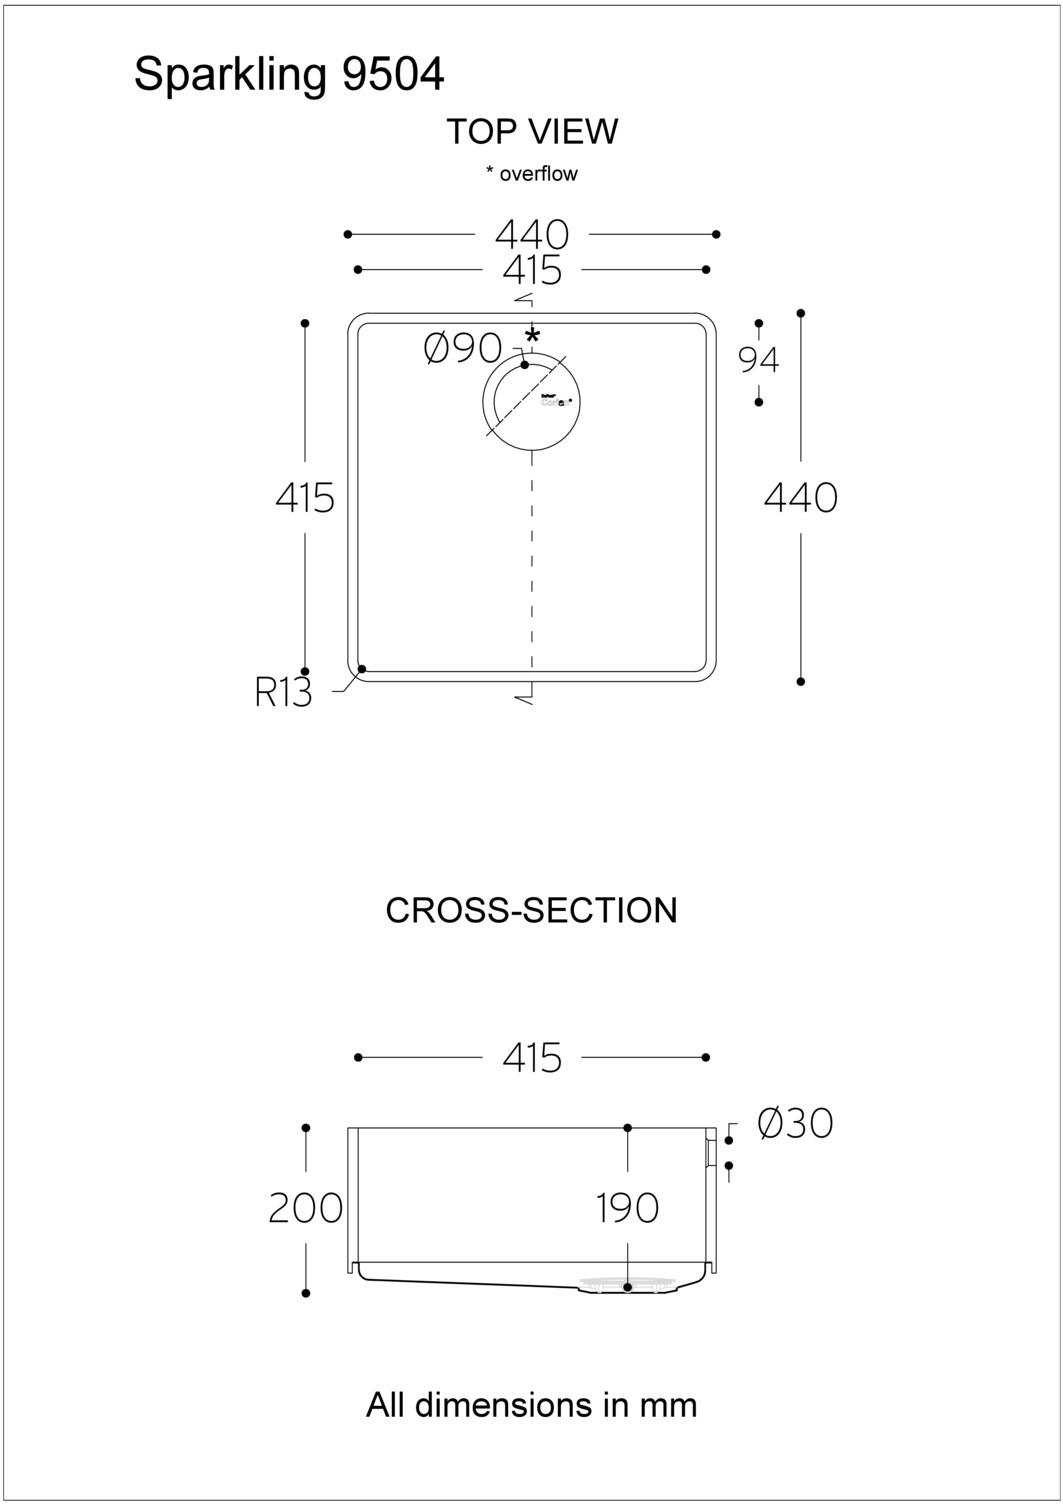 DUPONT_CORIAN_SPARKLING9504_2D_PDF[0]